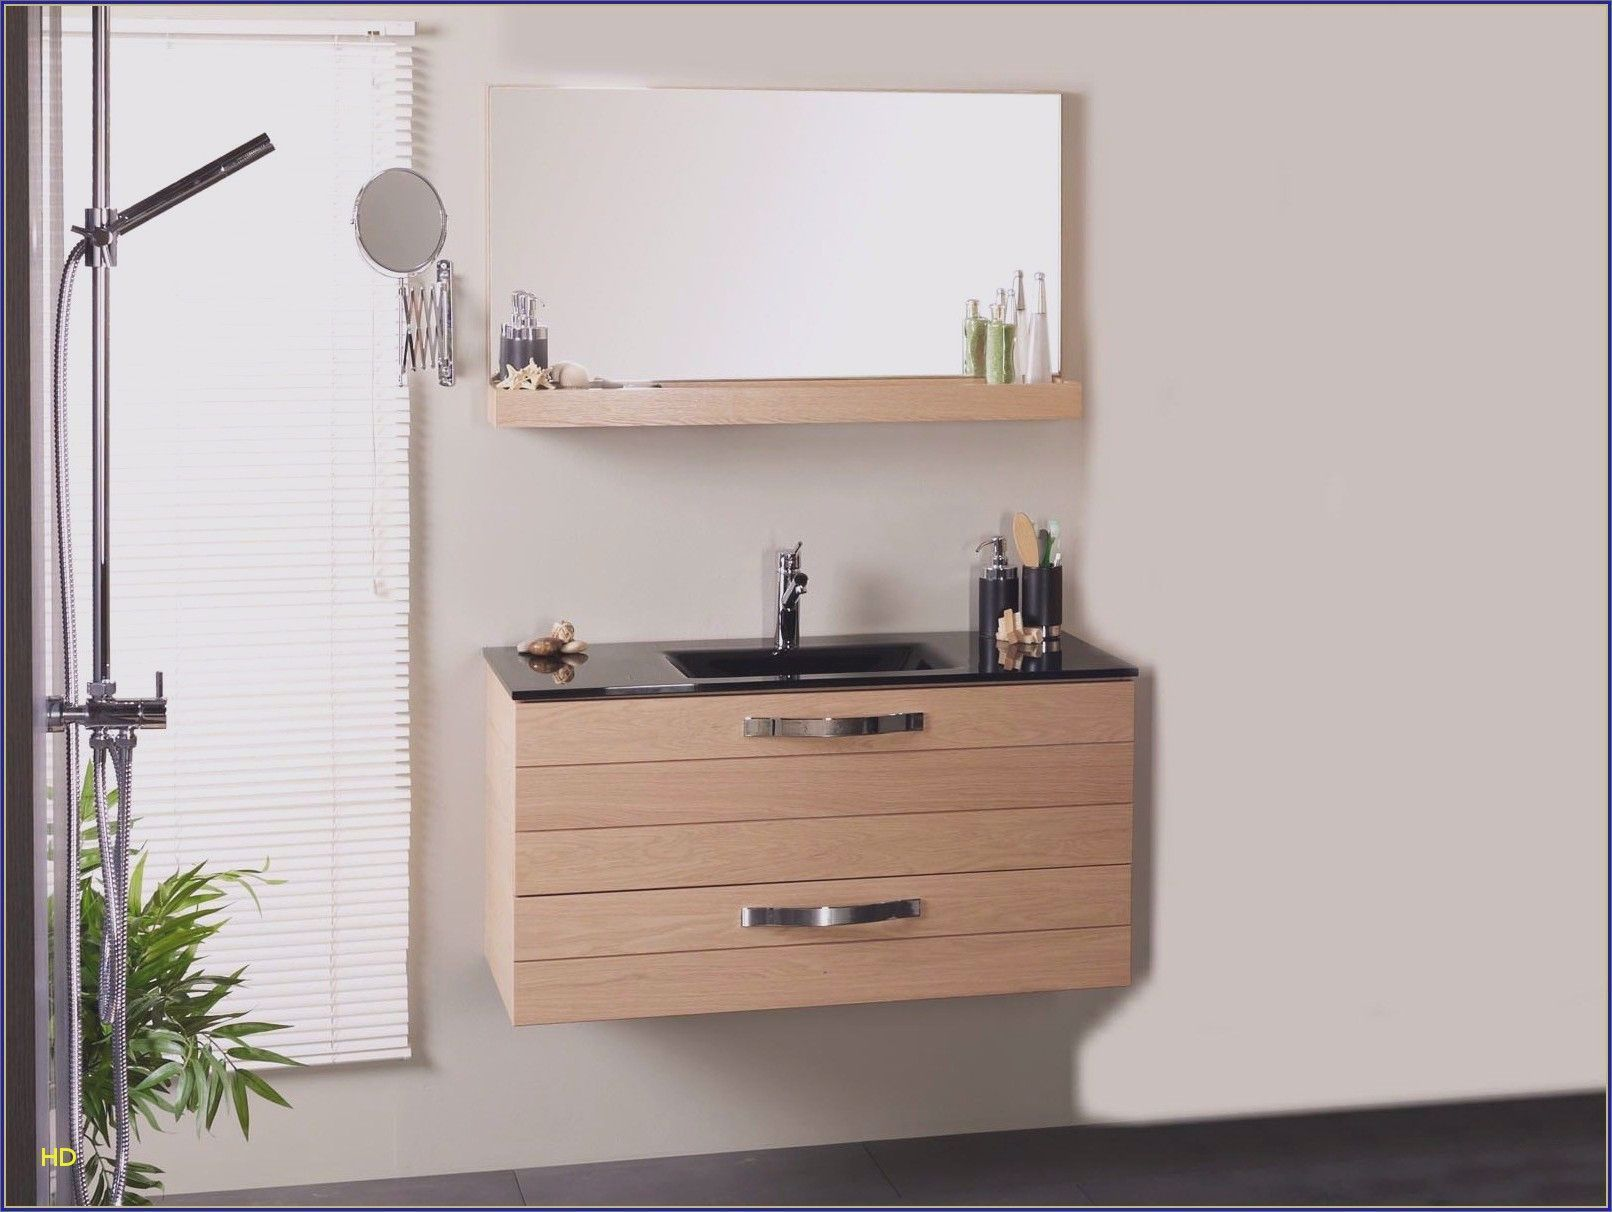 Pied Meuble Salle De Bain Ikea armoire #bain #ikea #rangement #salle armoire salle de bain